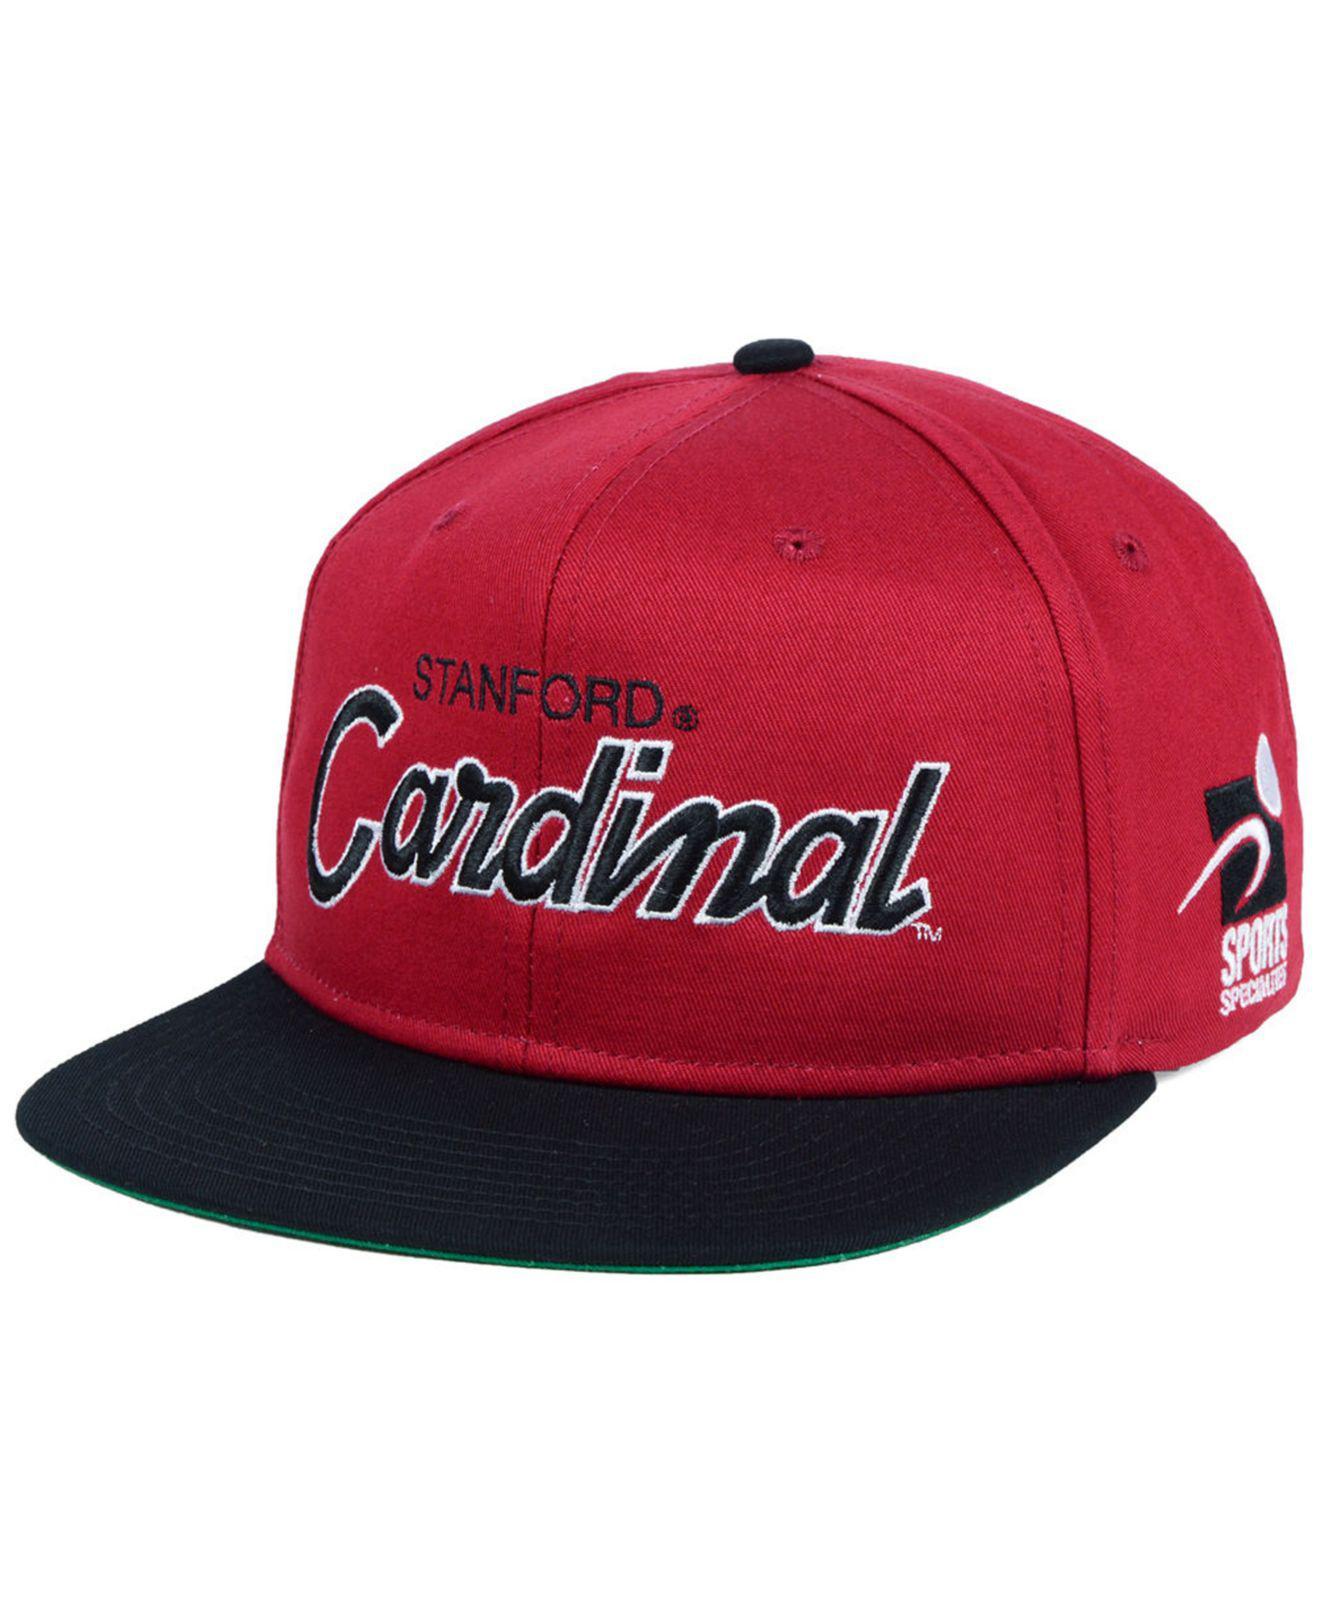 caa33021dbf Lyst - Nike Stanford Cardinal Sport Specialties Snapback Cap in Red ...